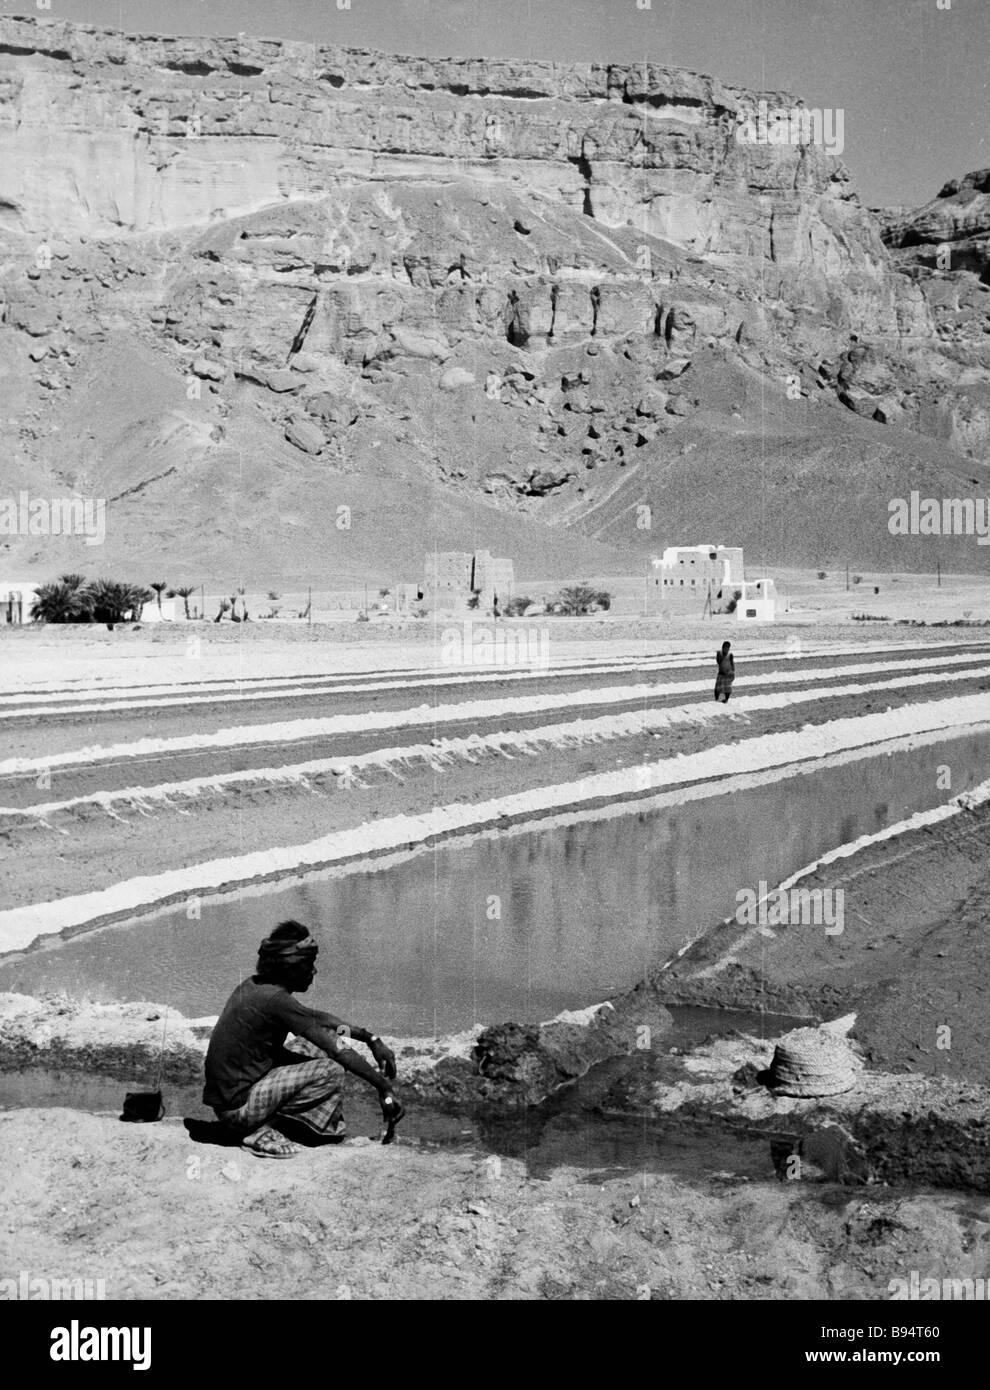 Irrigational system Bore agrarian farm Yemen - Stock Image